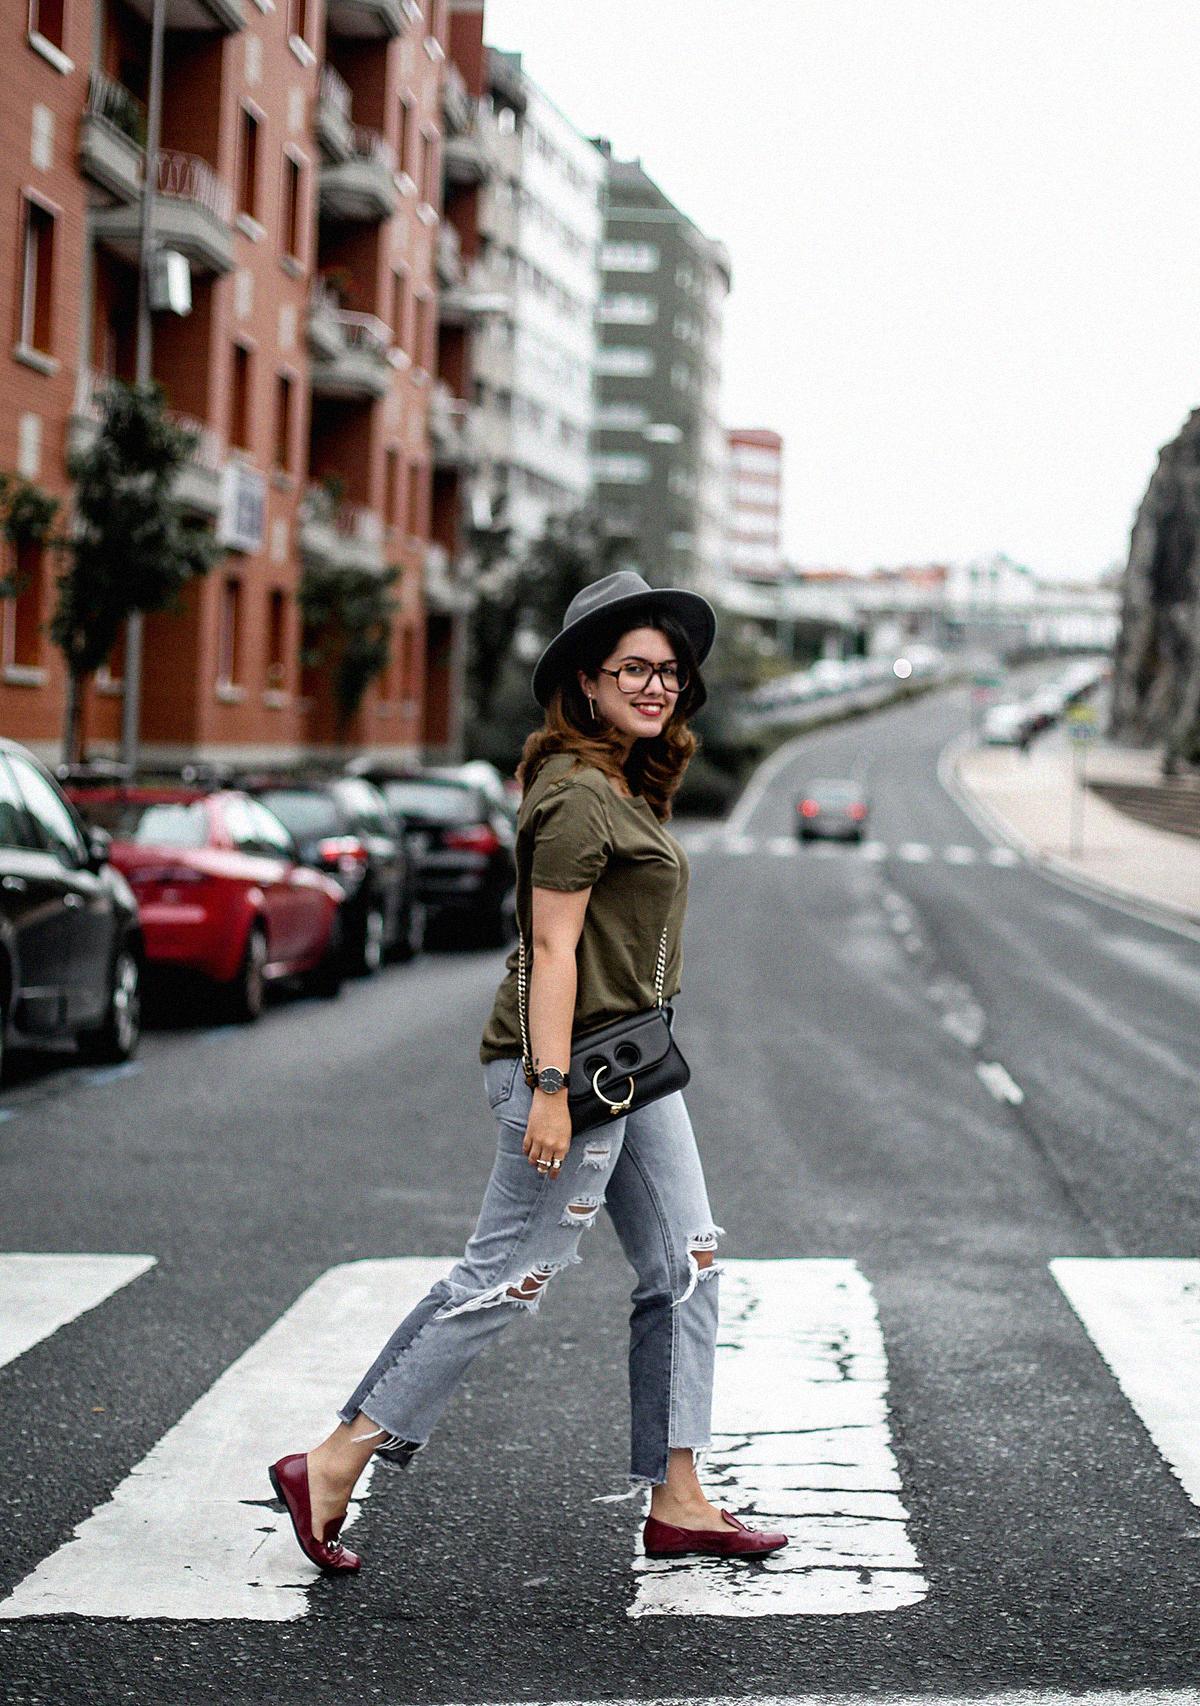 camiseta-verde-militar-basica-look-gucci-horsebit-mocasines-streetstyle